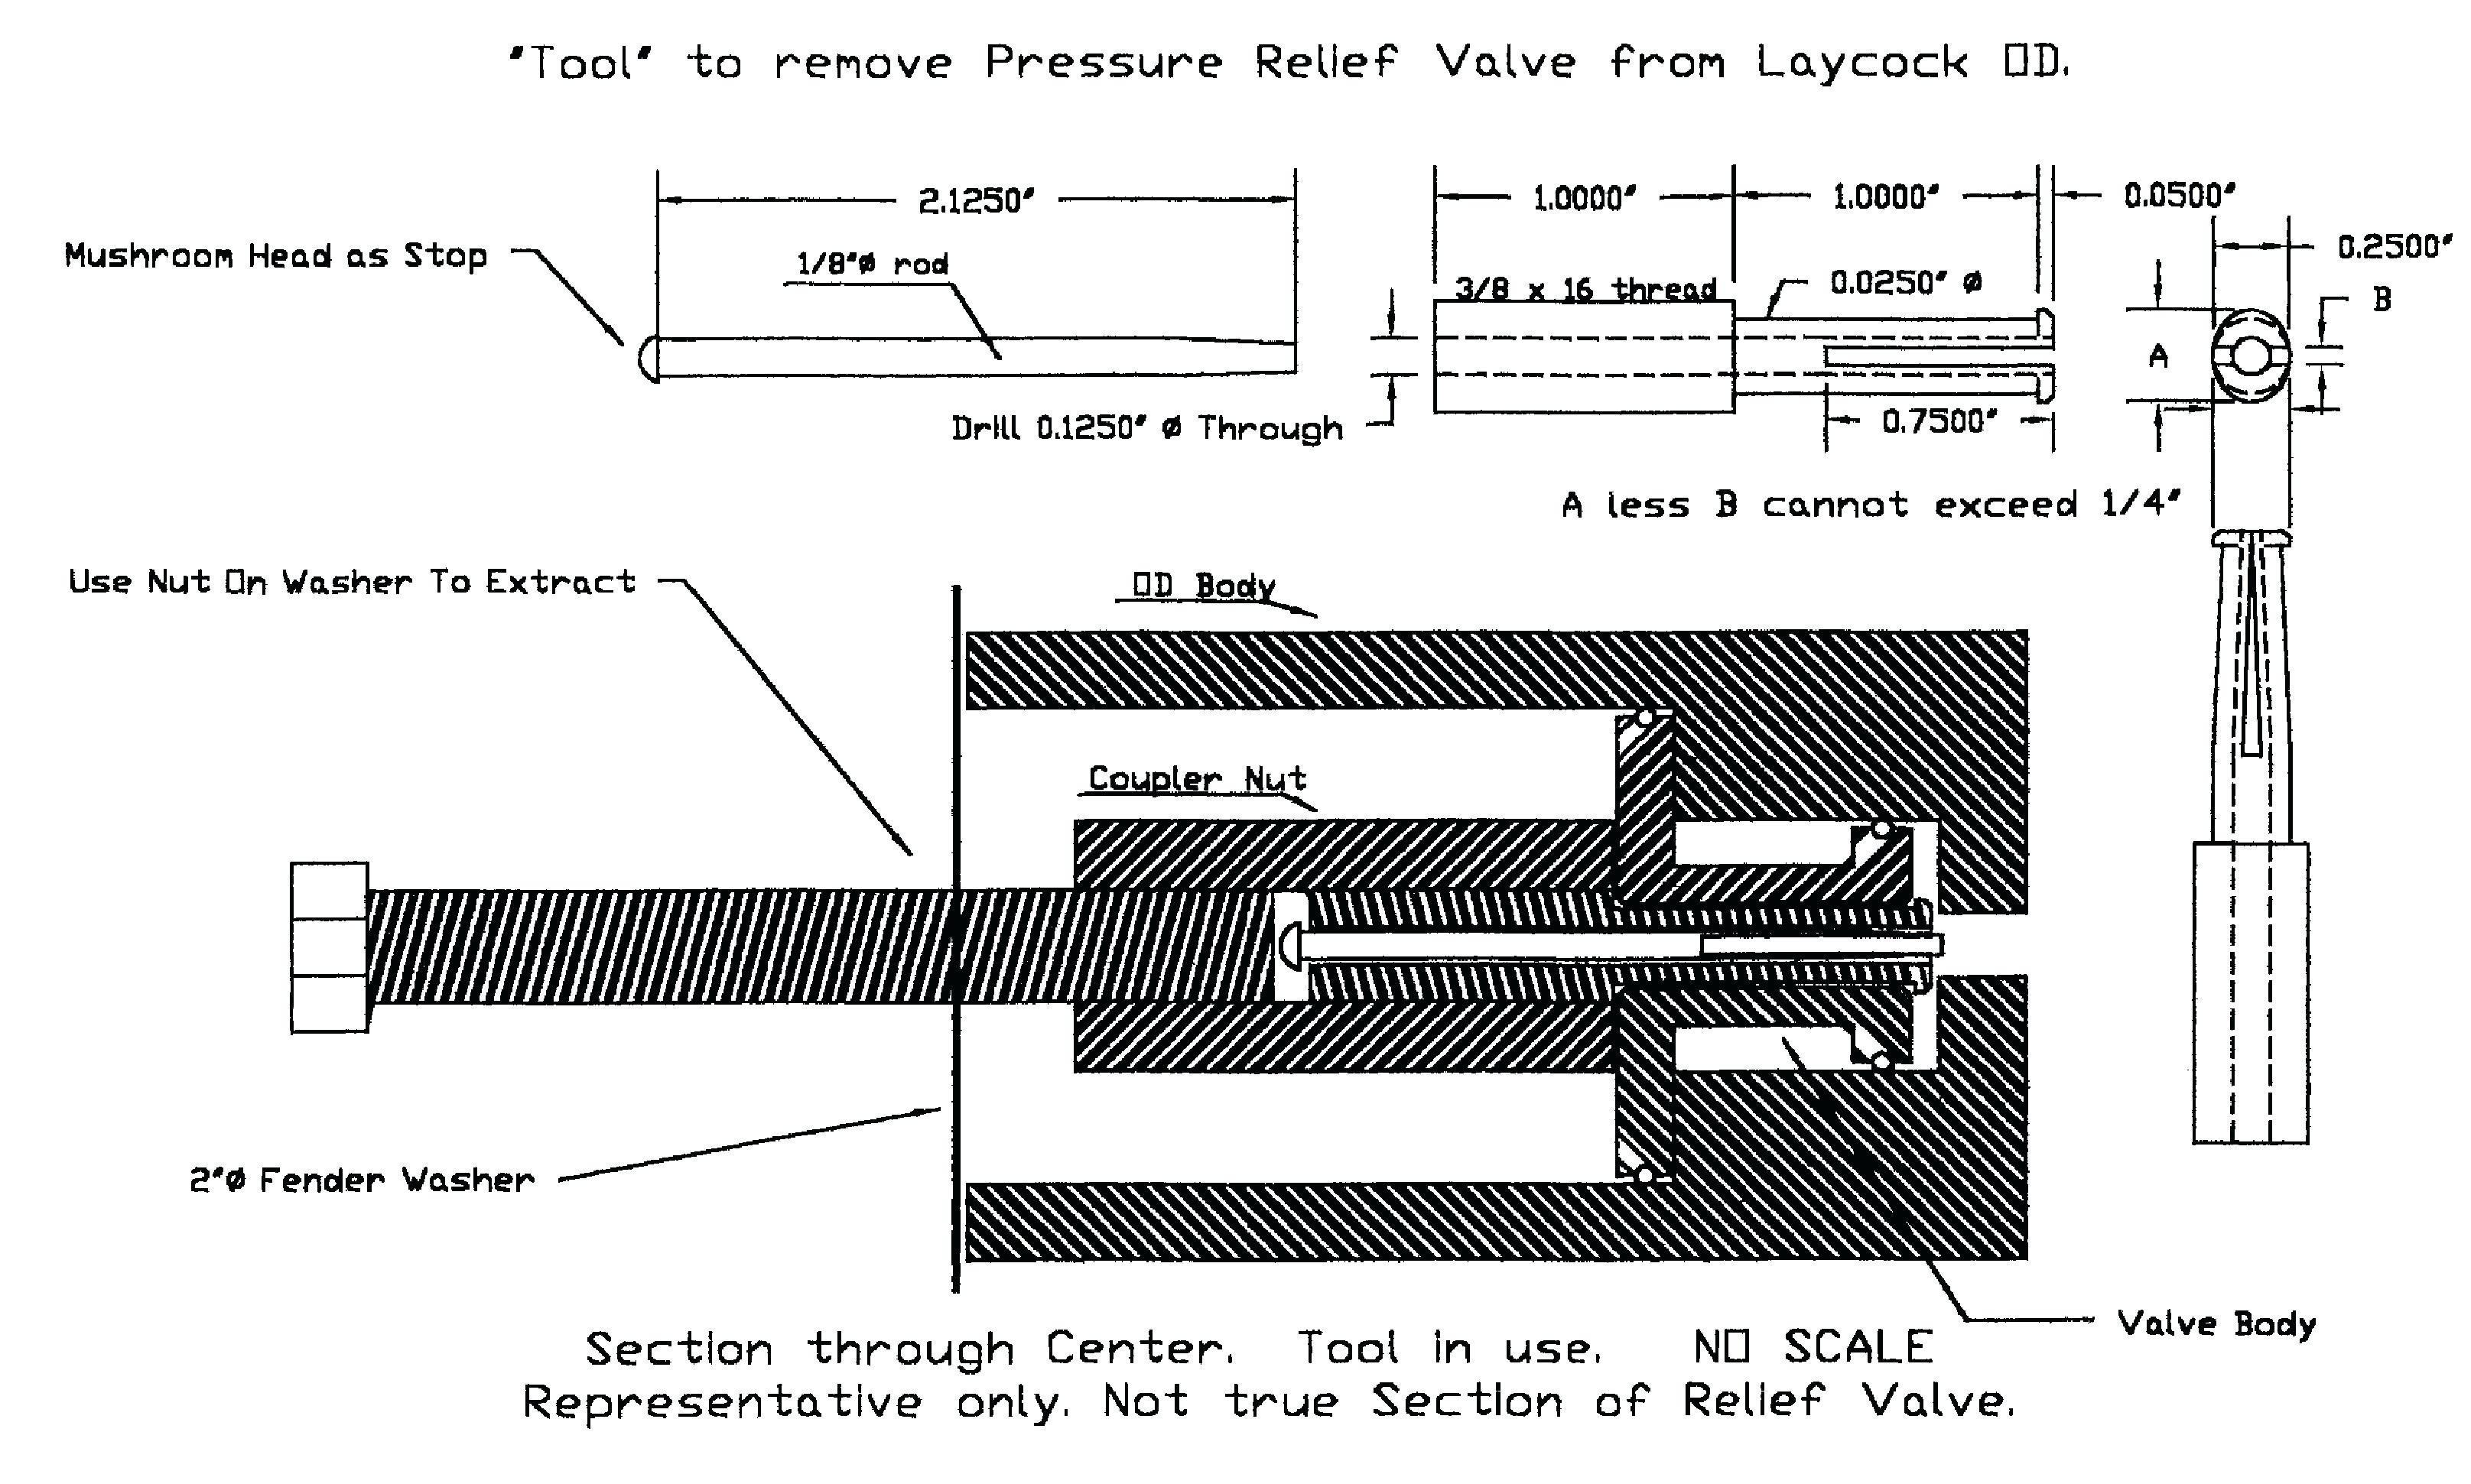 Yamaha Banshee Engine Diagram Wiring Related Post